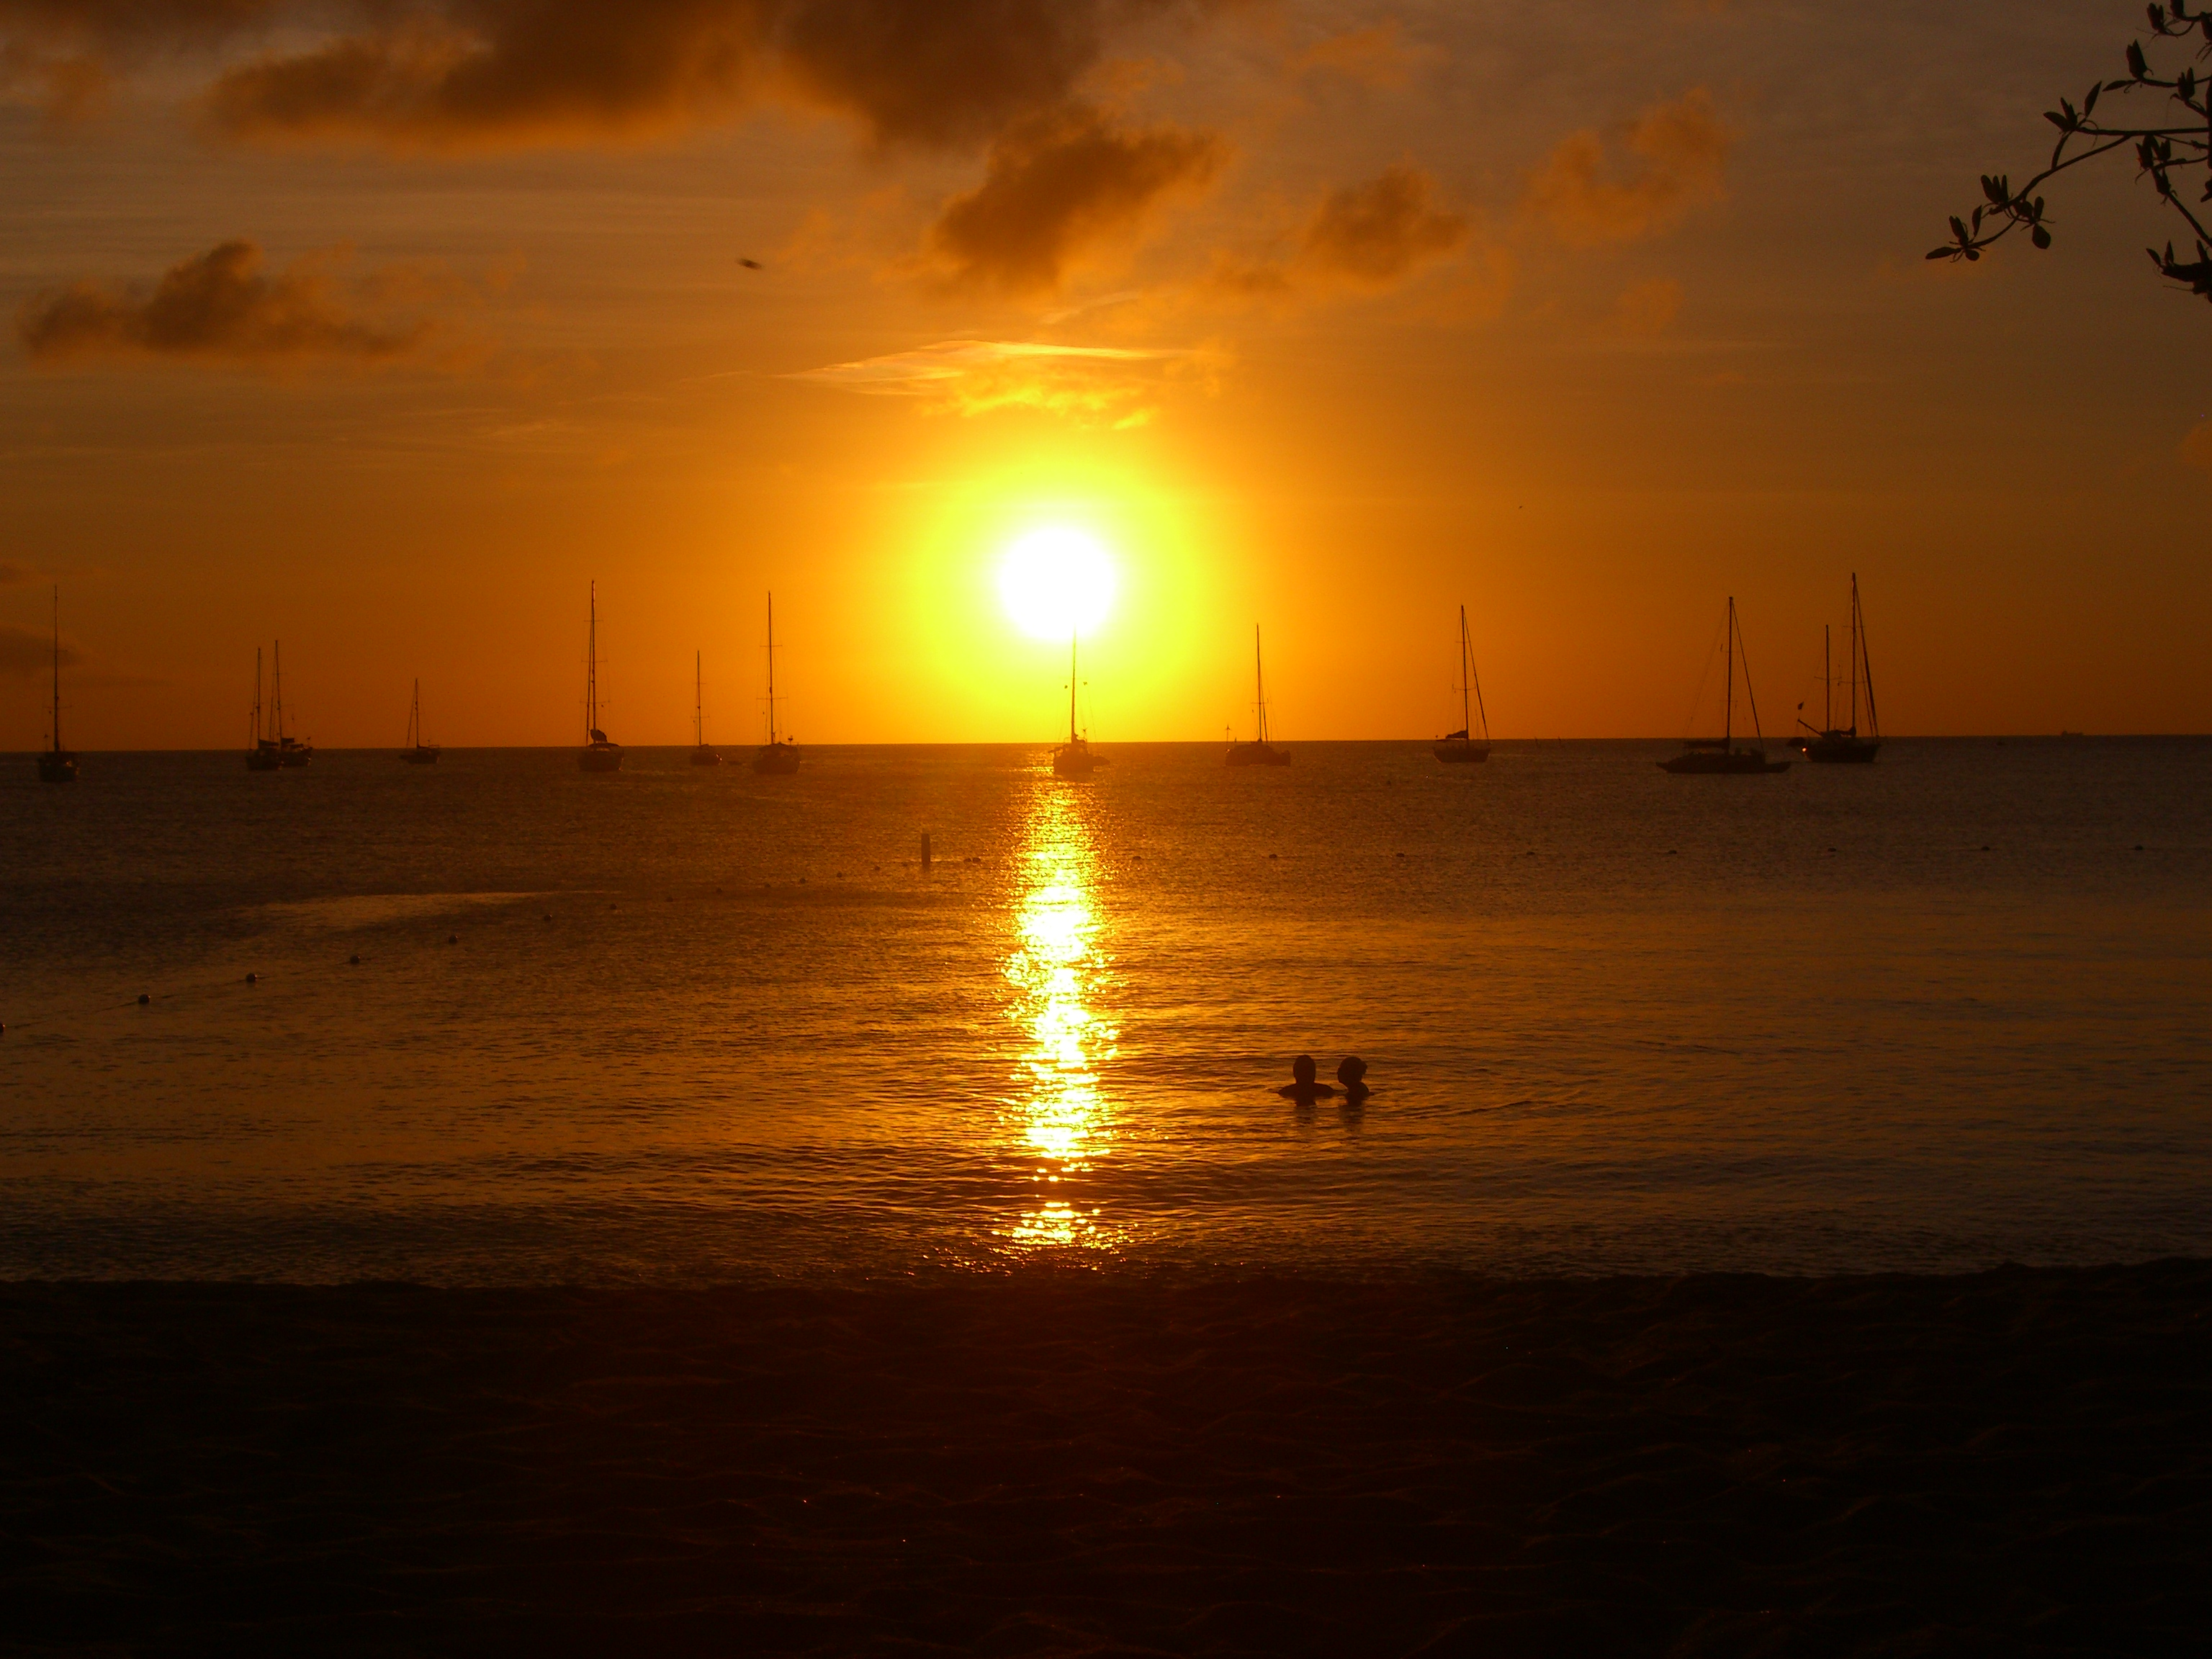 Sunset, Reduit Beach, at Rodney Bay, St Lucia